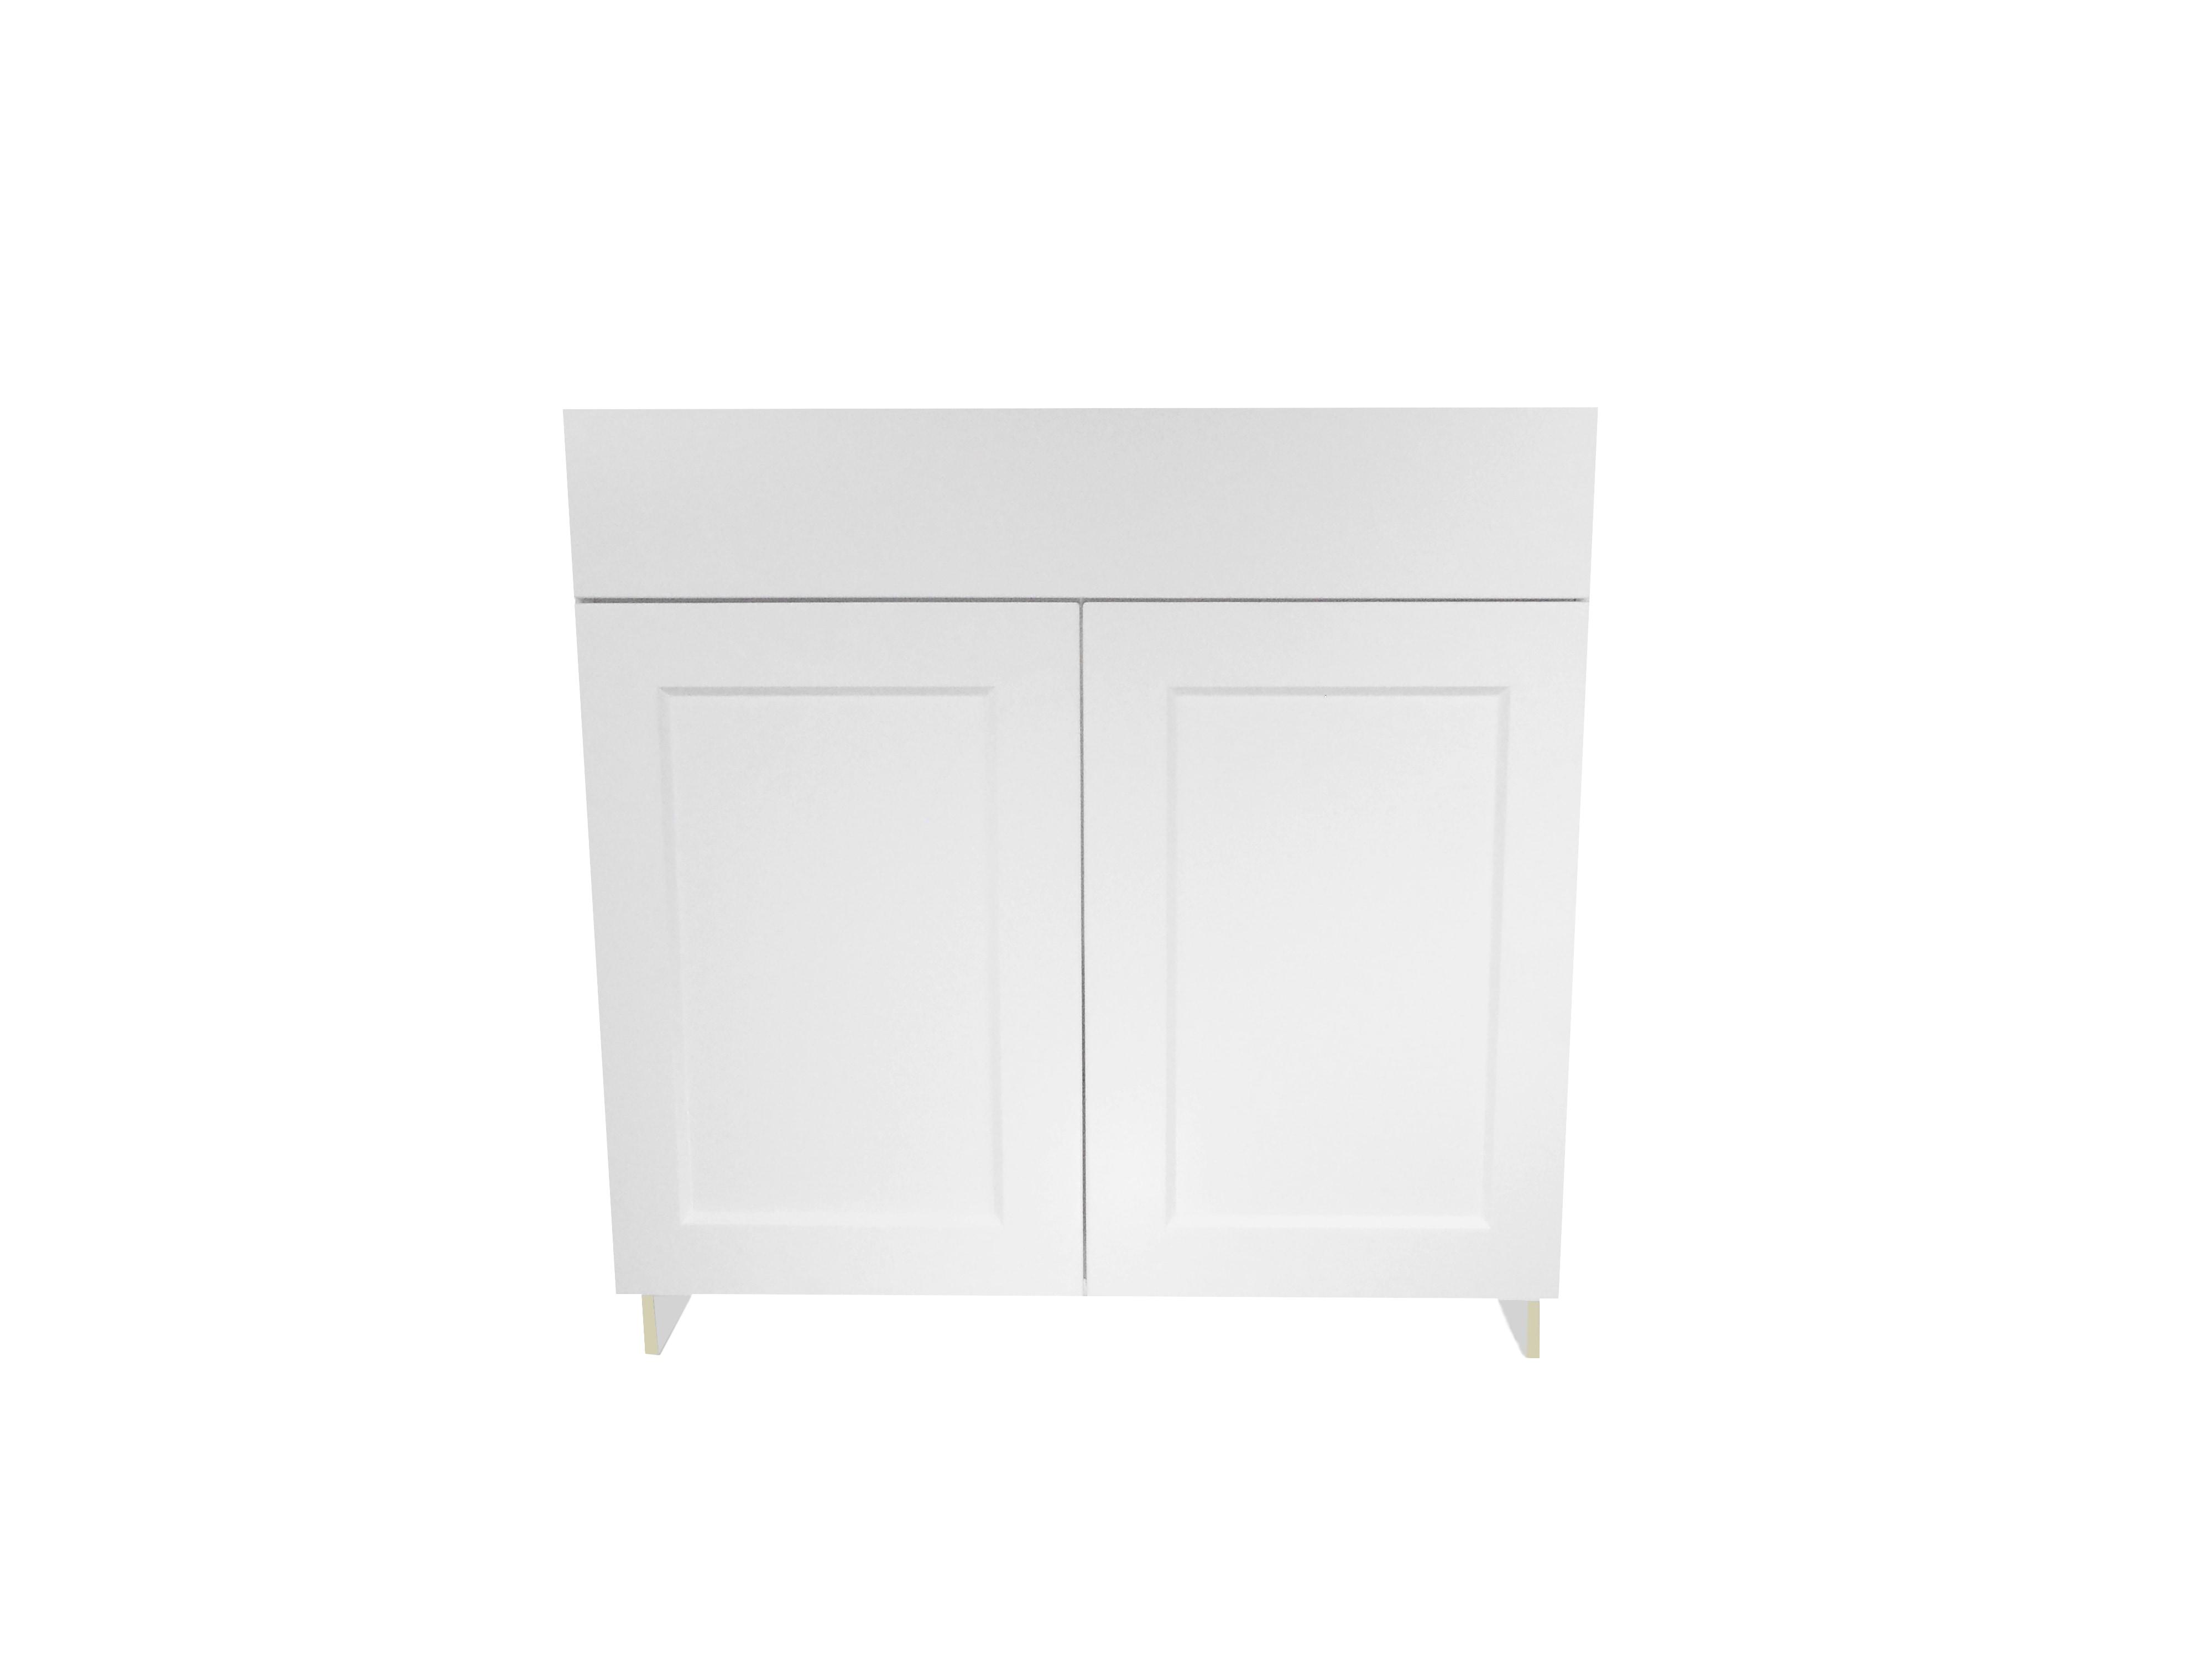 Sink Base Cabinet with 2 Door / Wistler White / Flat Panel White / 33 Whistler White 0